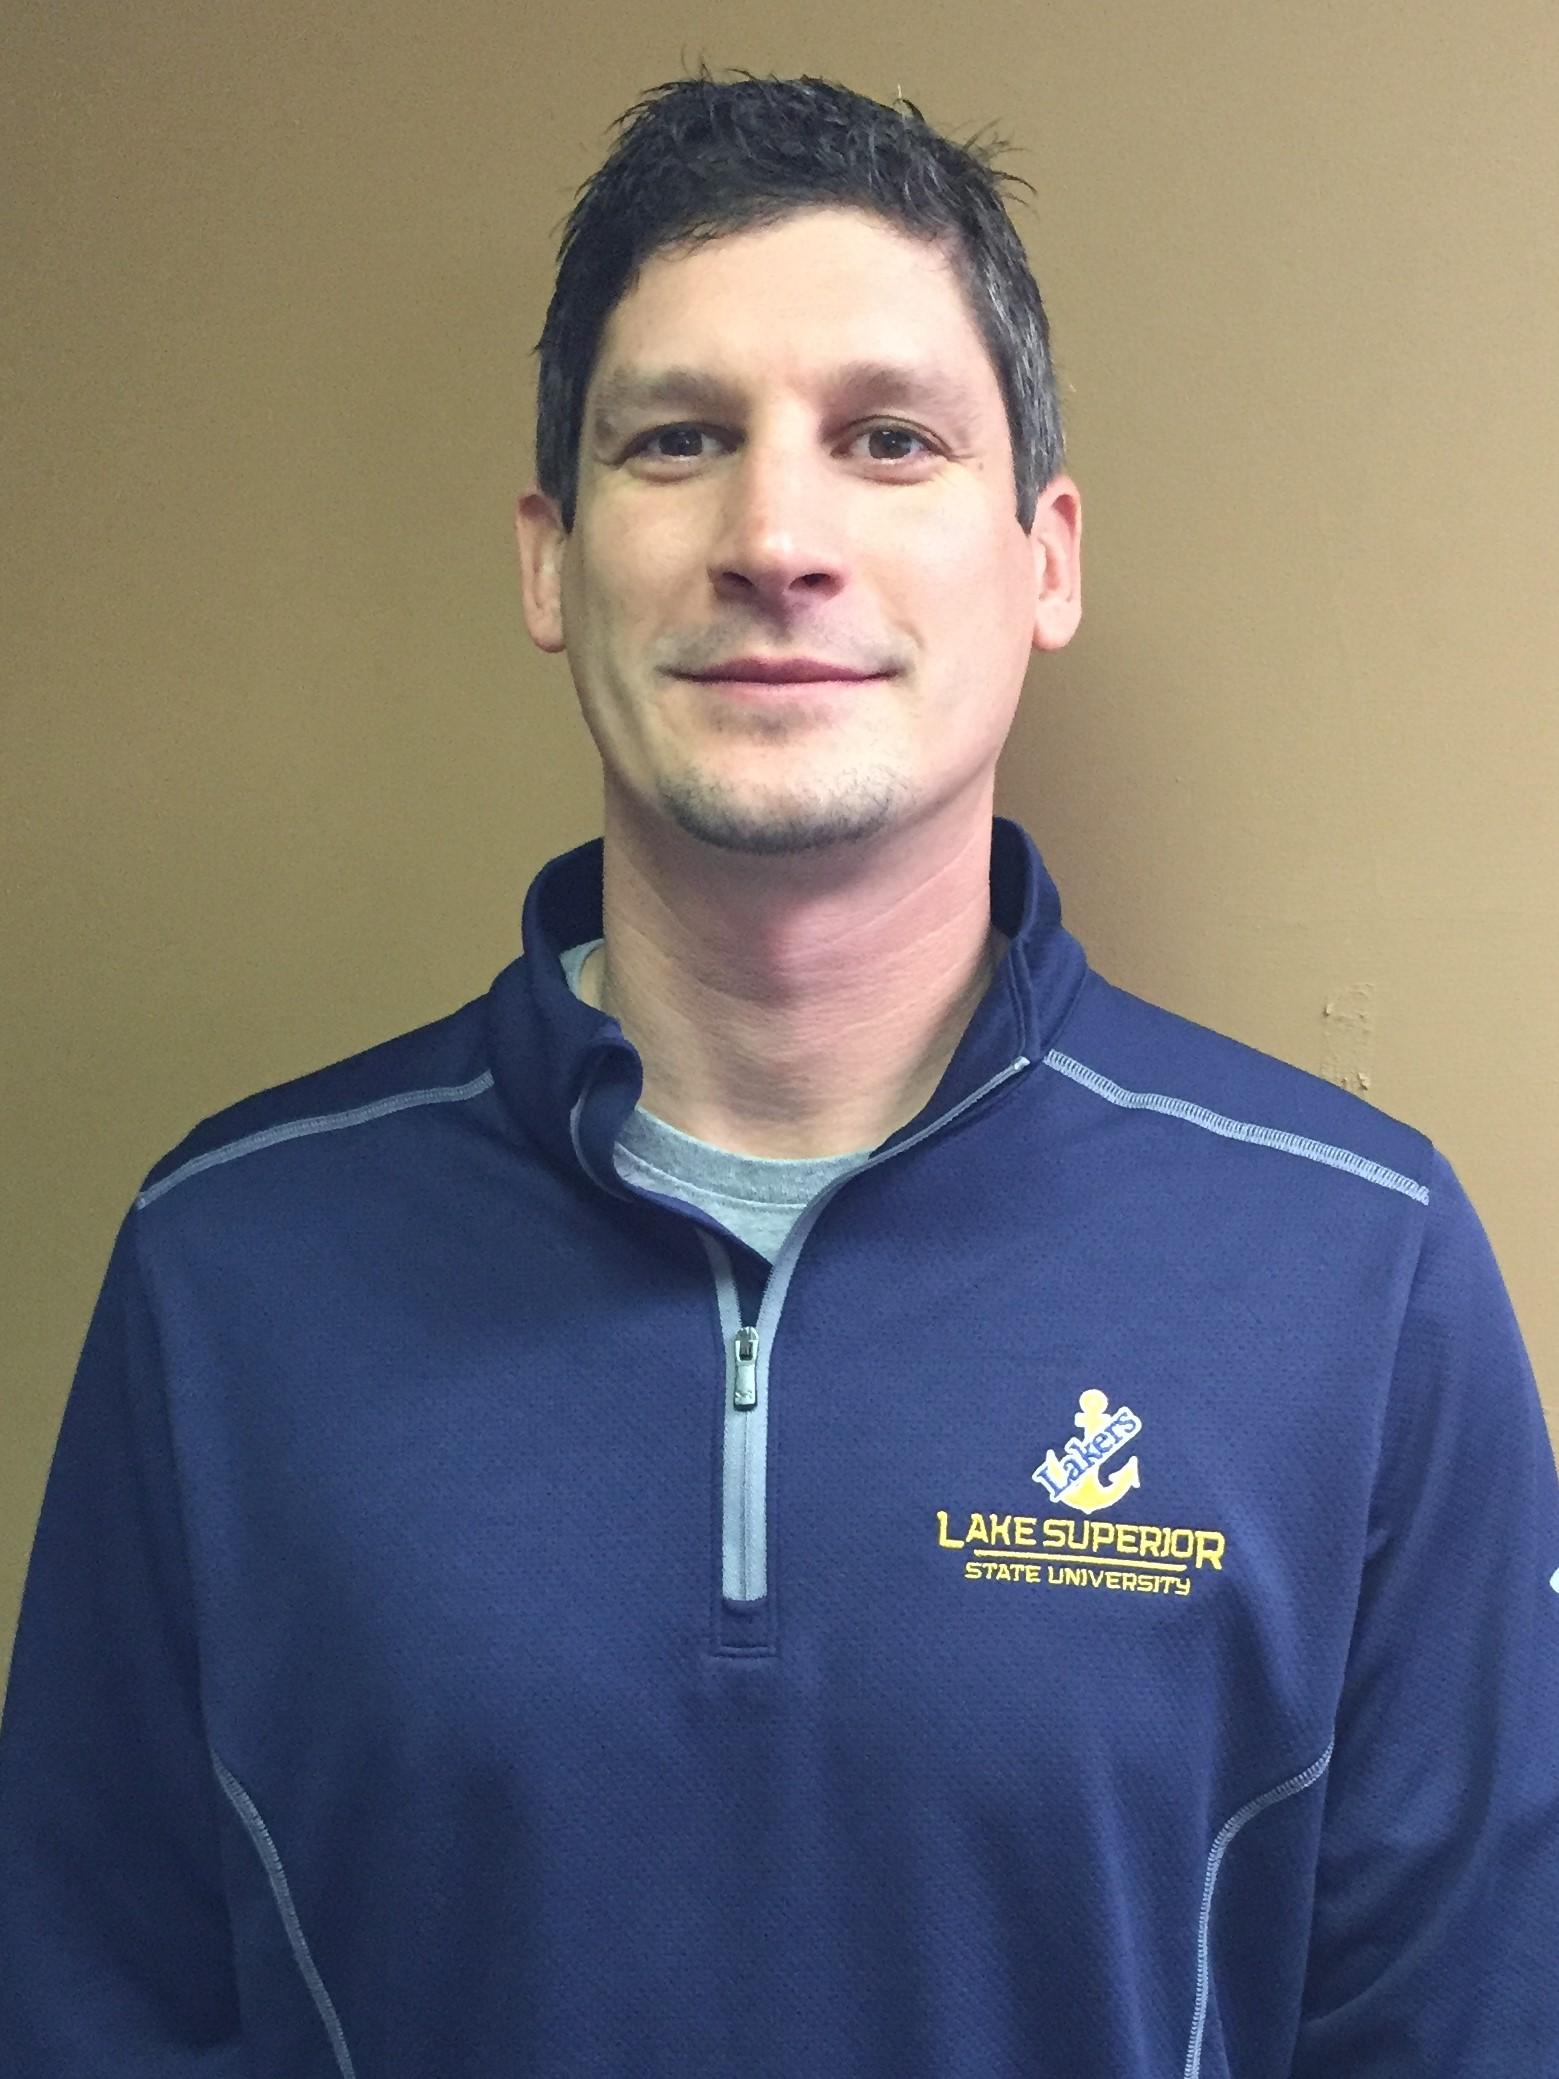 Chris Oshelski, Lake Superior State University